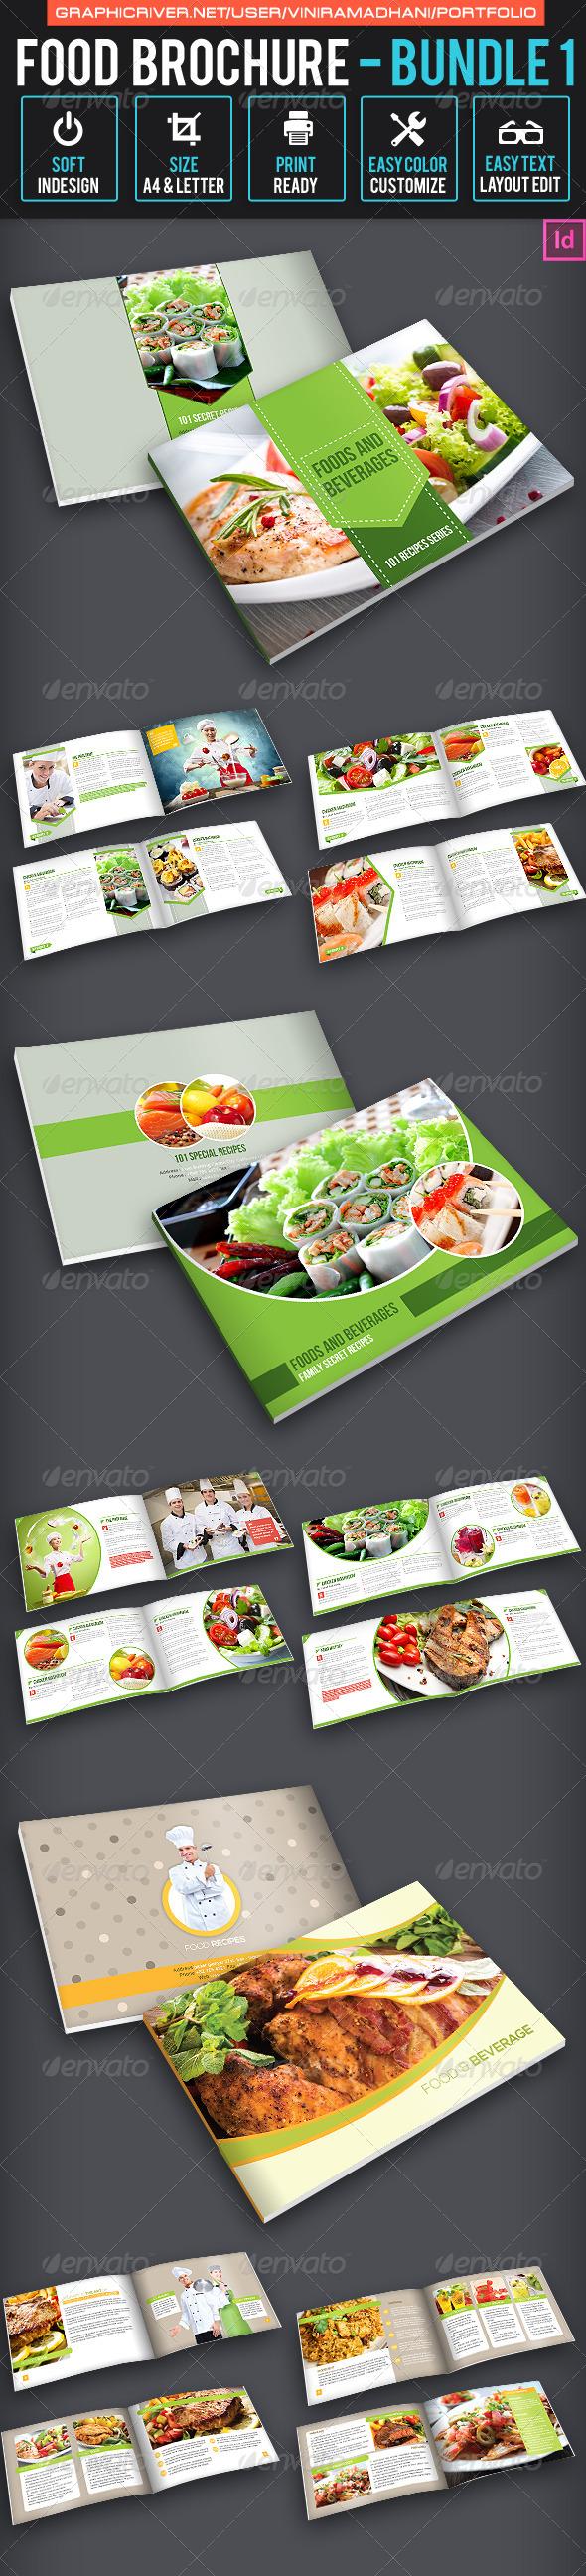 Food Brochure Bundle 1 - Catalogs Brochures